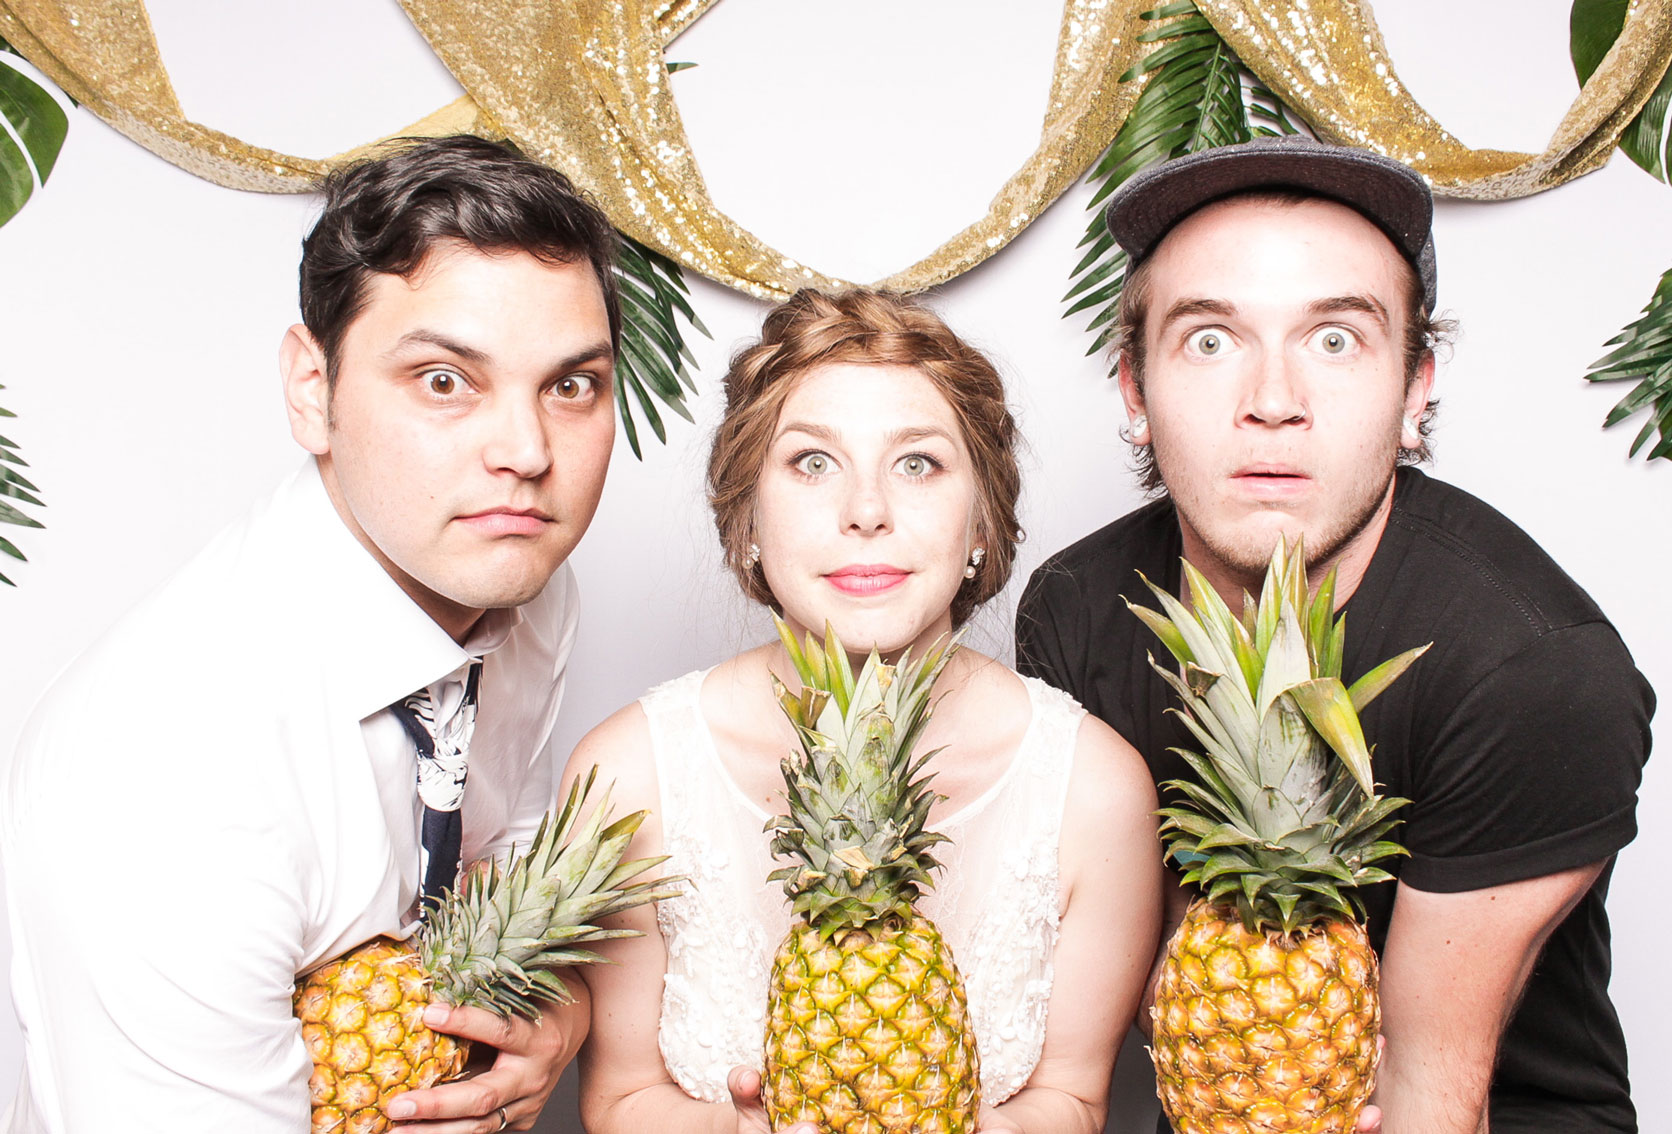 Wedding pineapple wedding photo experience